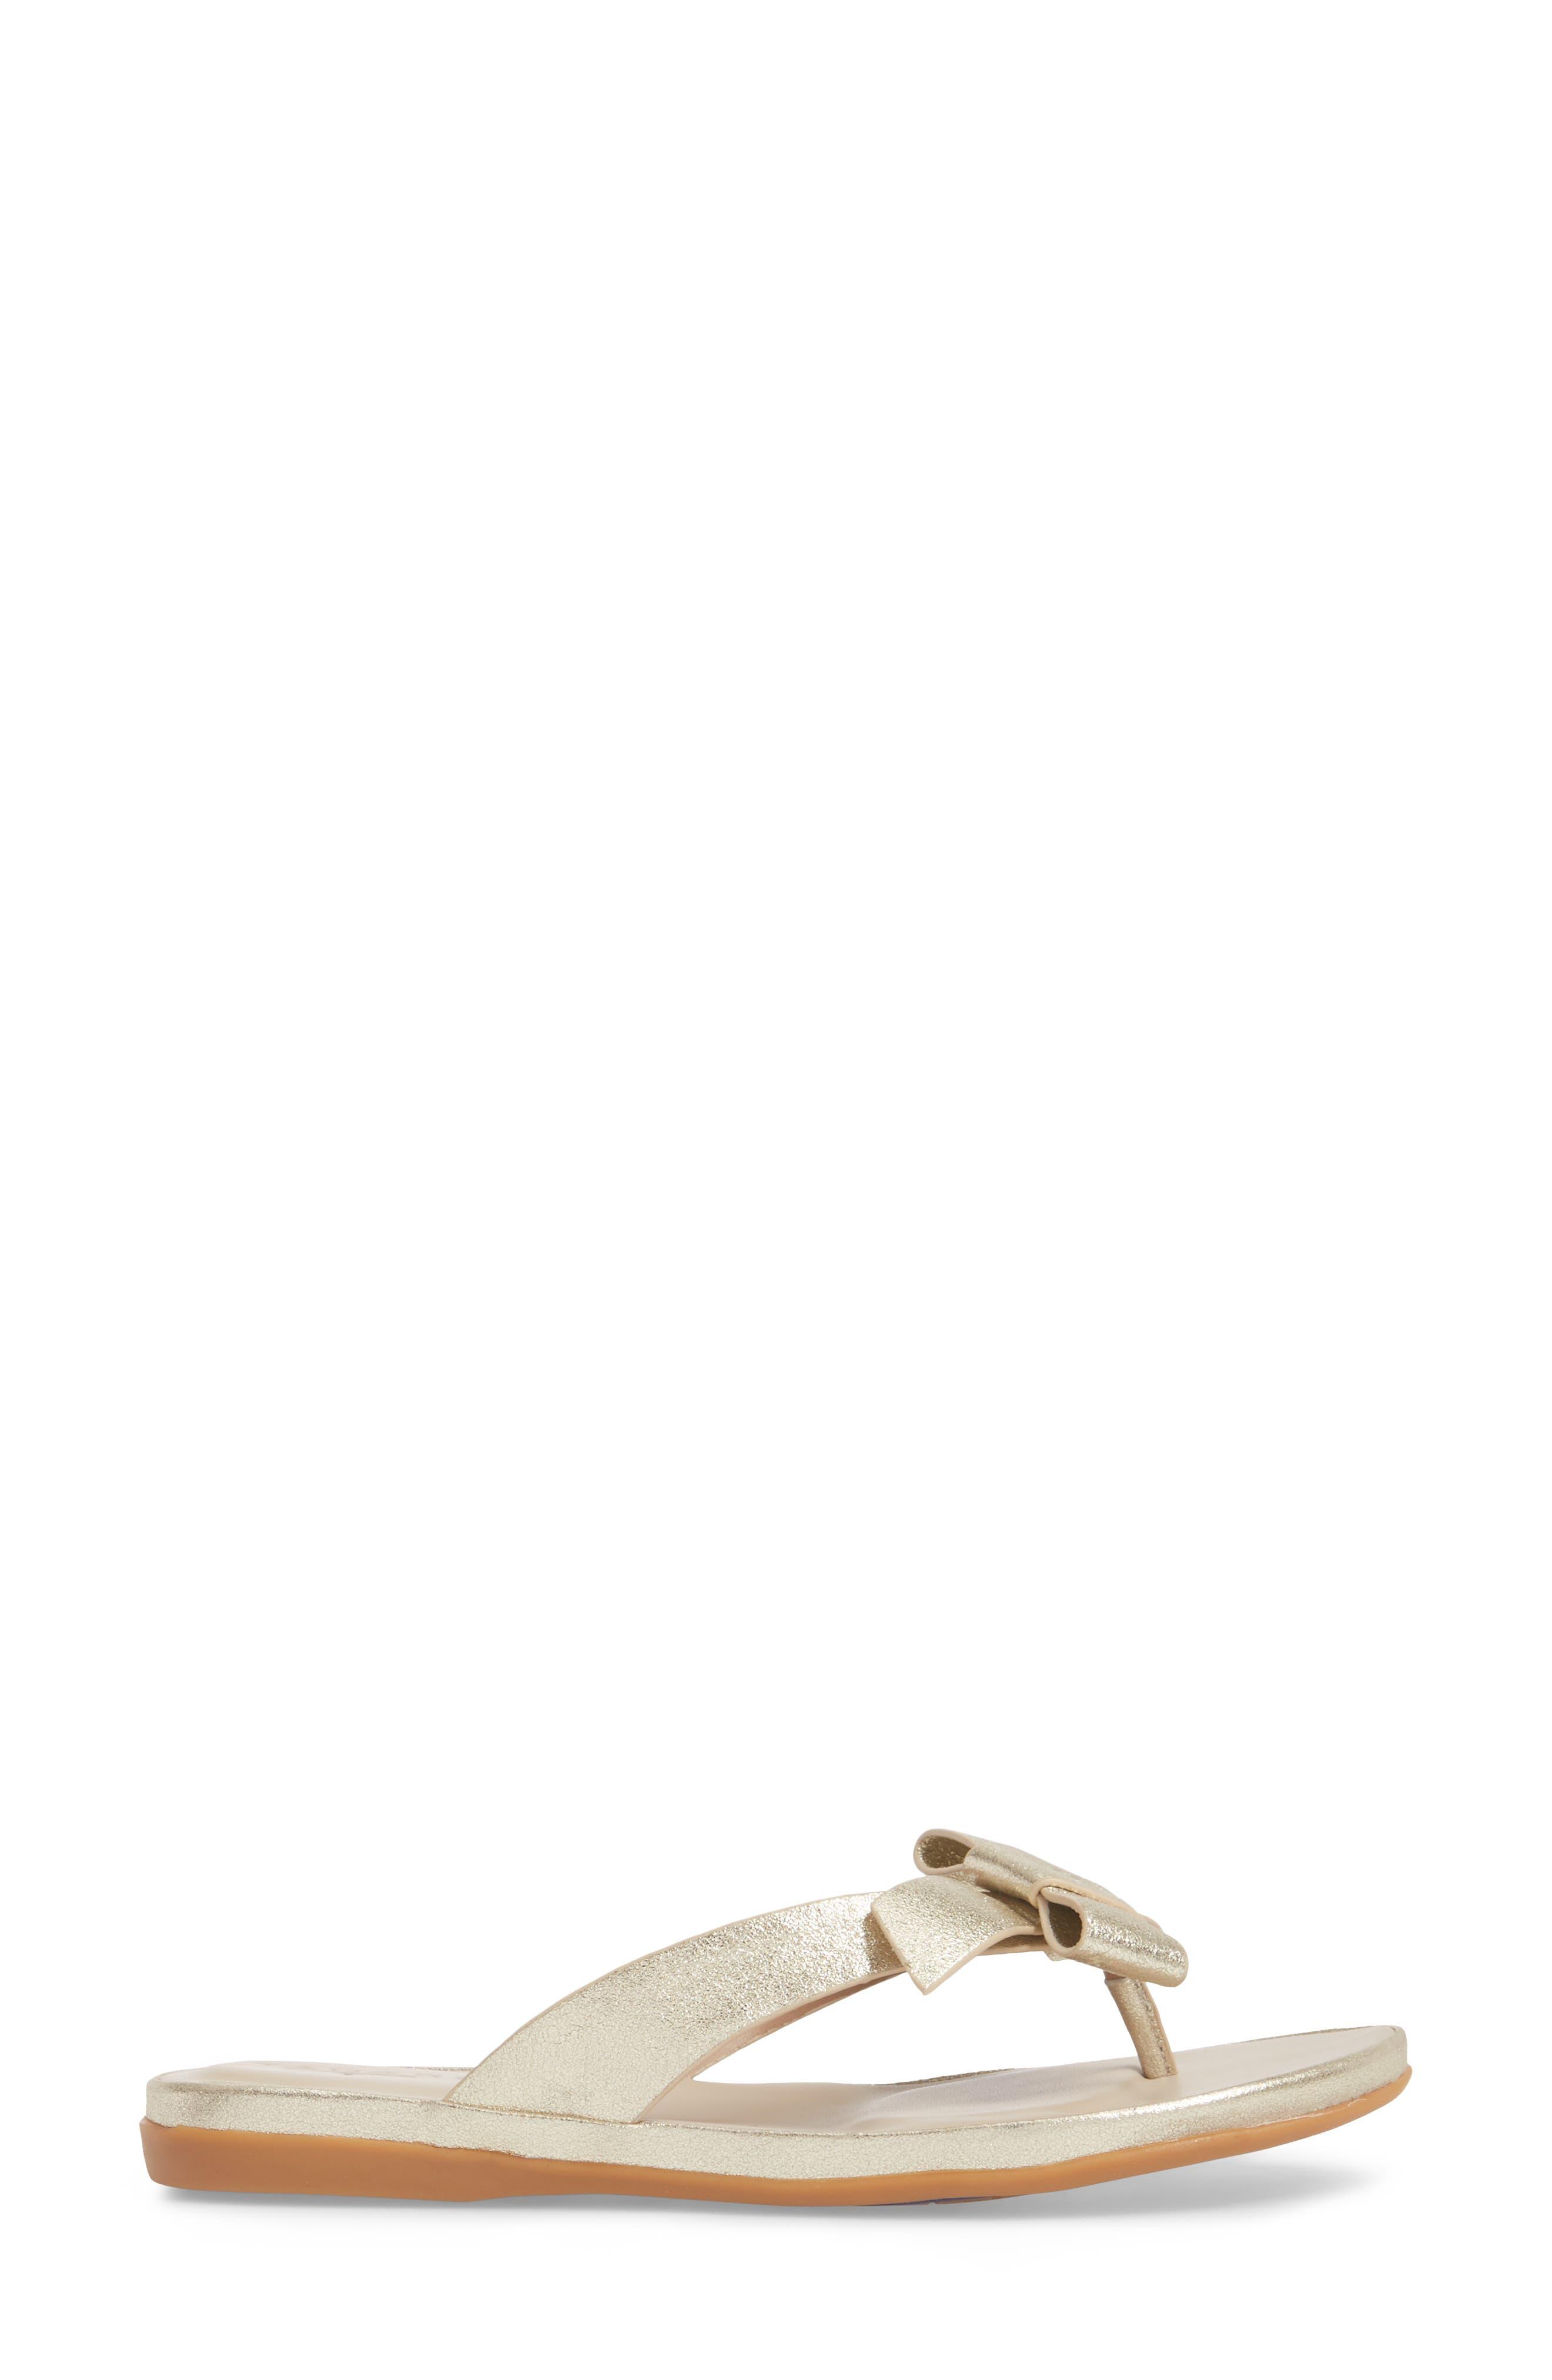 Aria Flip Flop,                             Alternate thumbnail 3, color,                             Warm Gold Leather